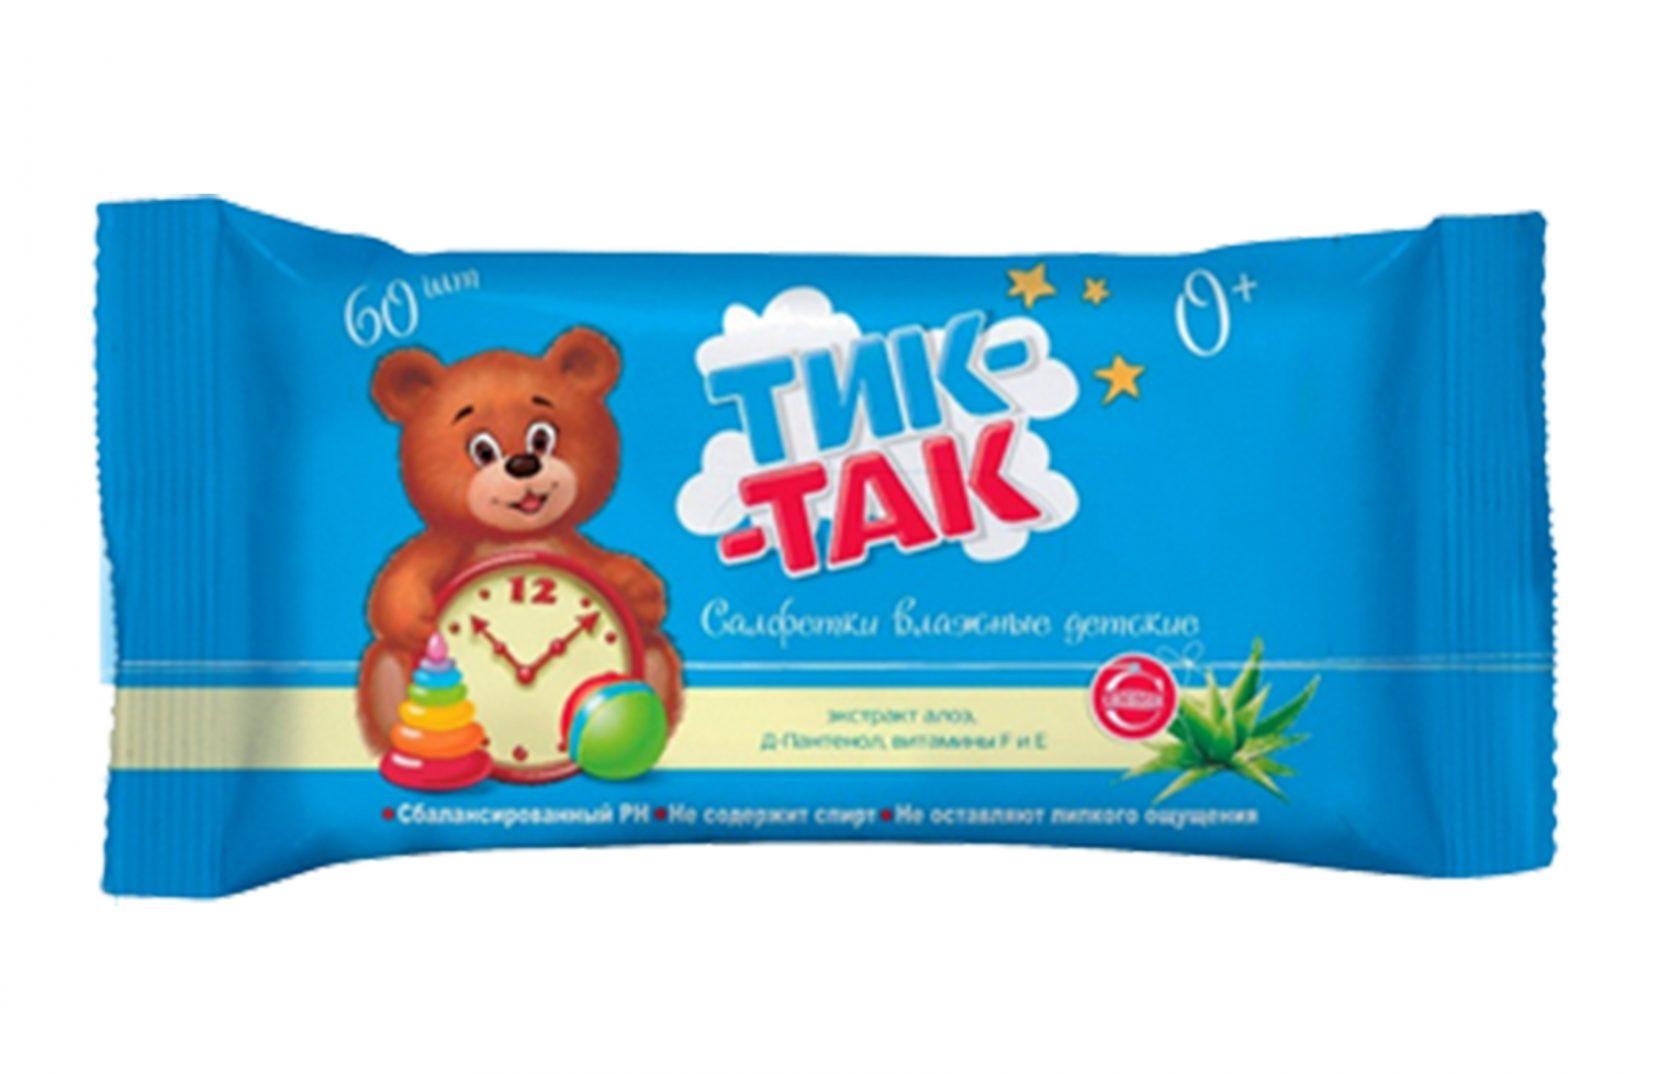 Салфетки ТИК-ТАК Детские влажн. 60шт Алоэ/Д-Пантенол/Витамин F и Е